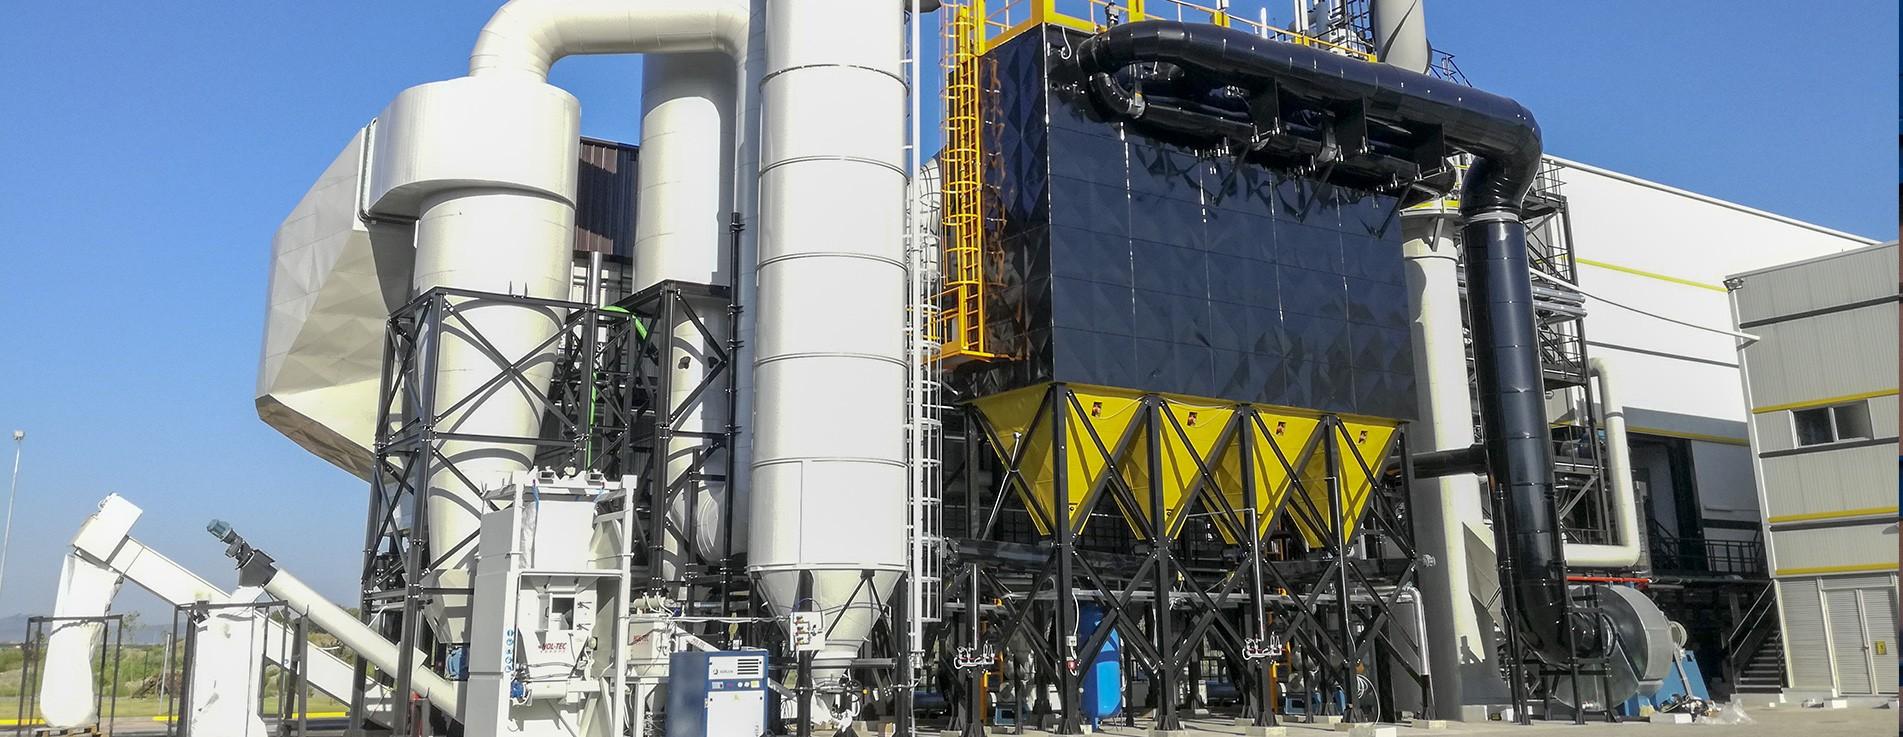 Industrielle Filtersysteme